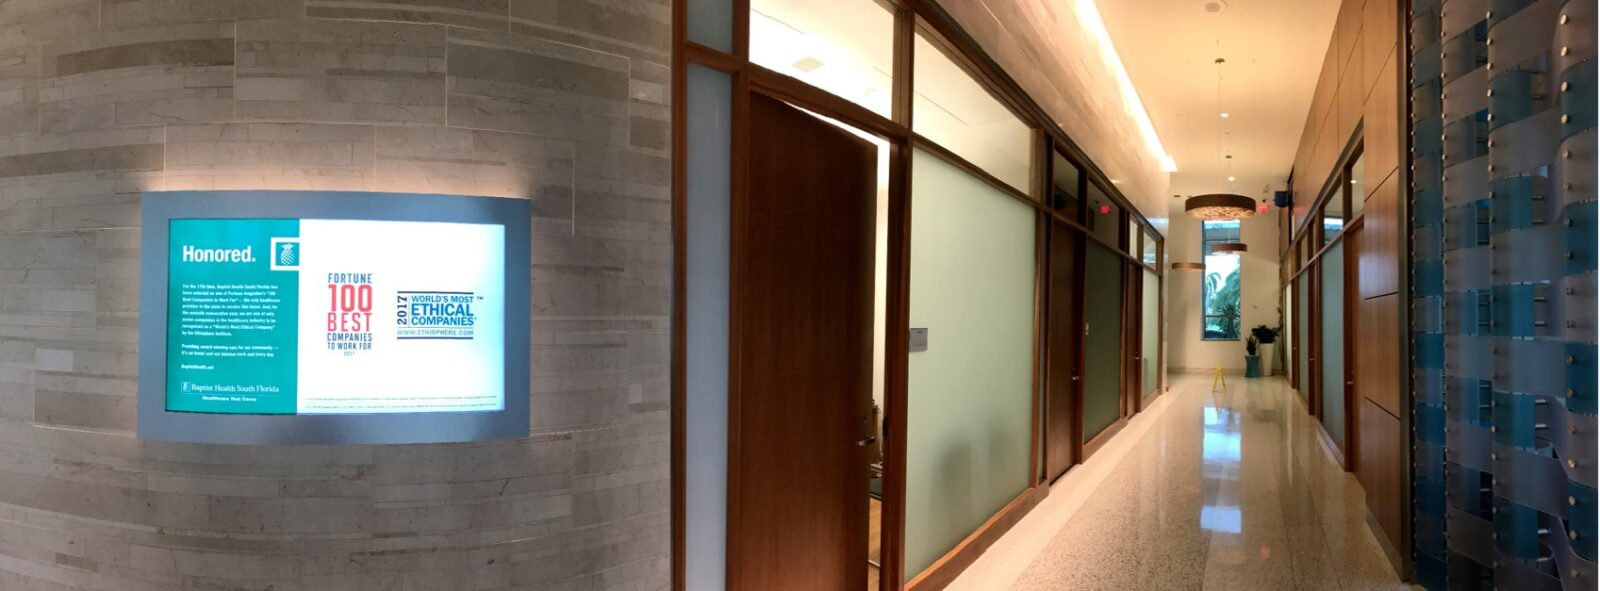 MCI Lobby Walkway